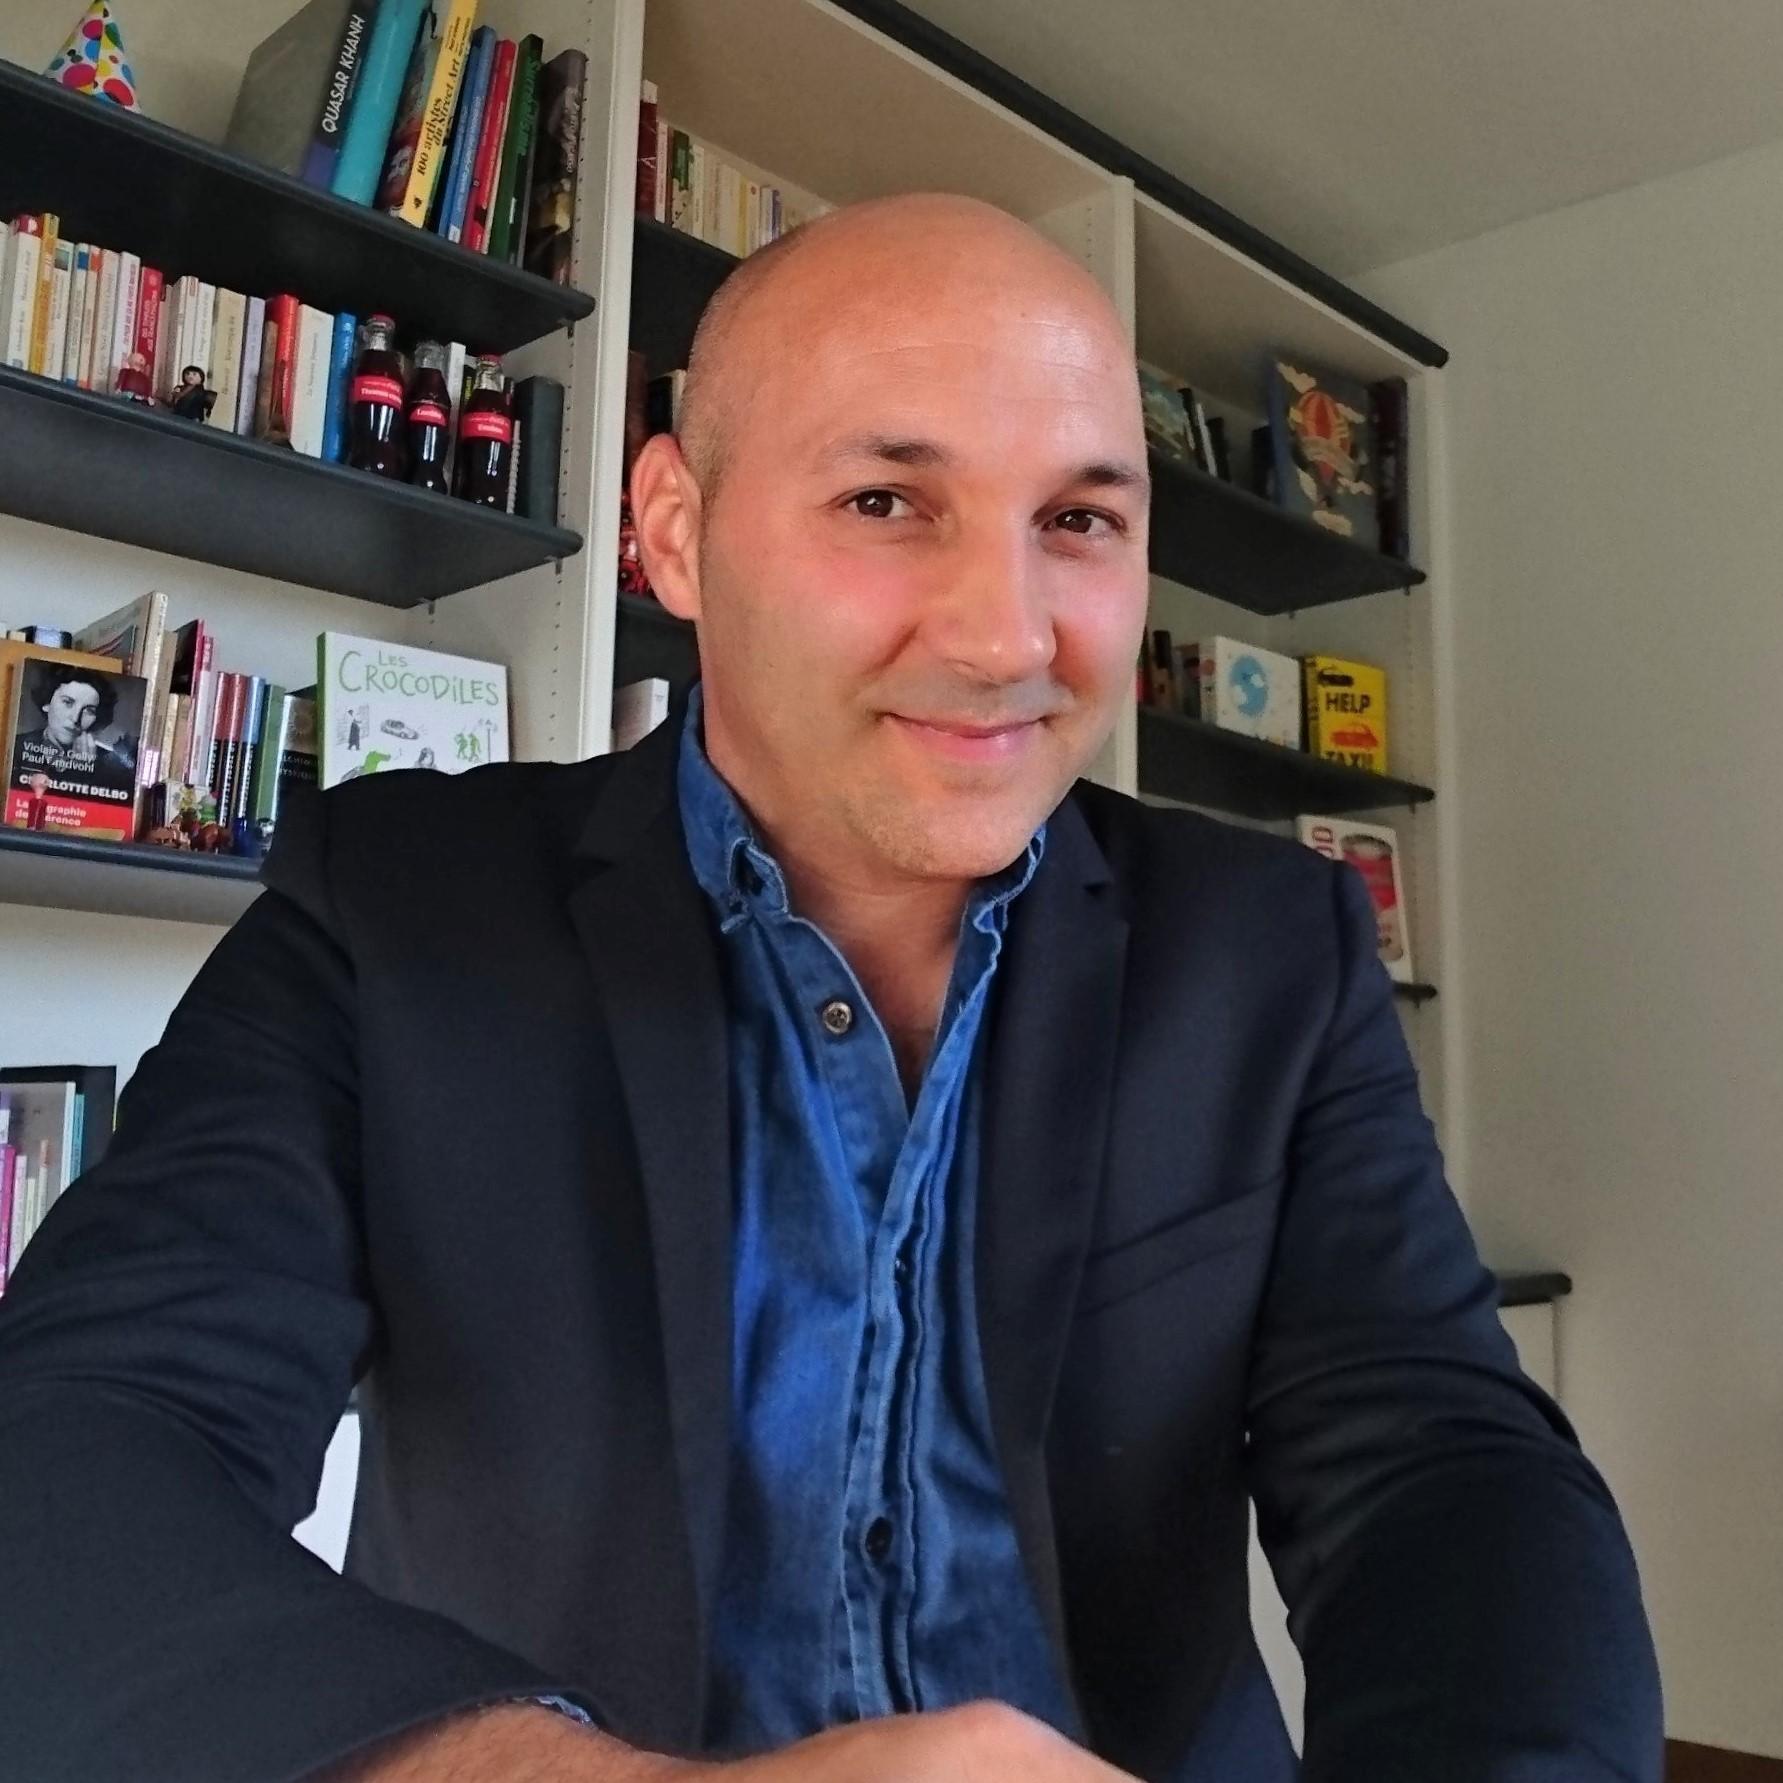 Thomas Cossin